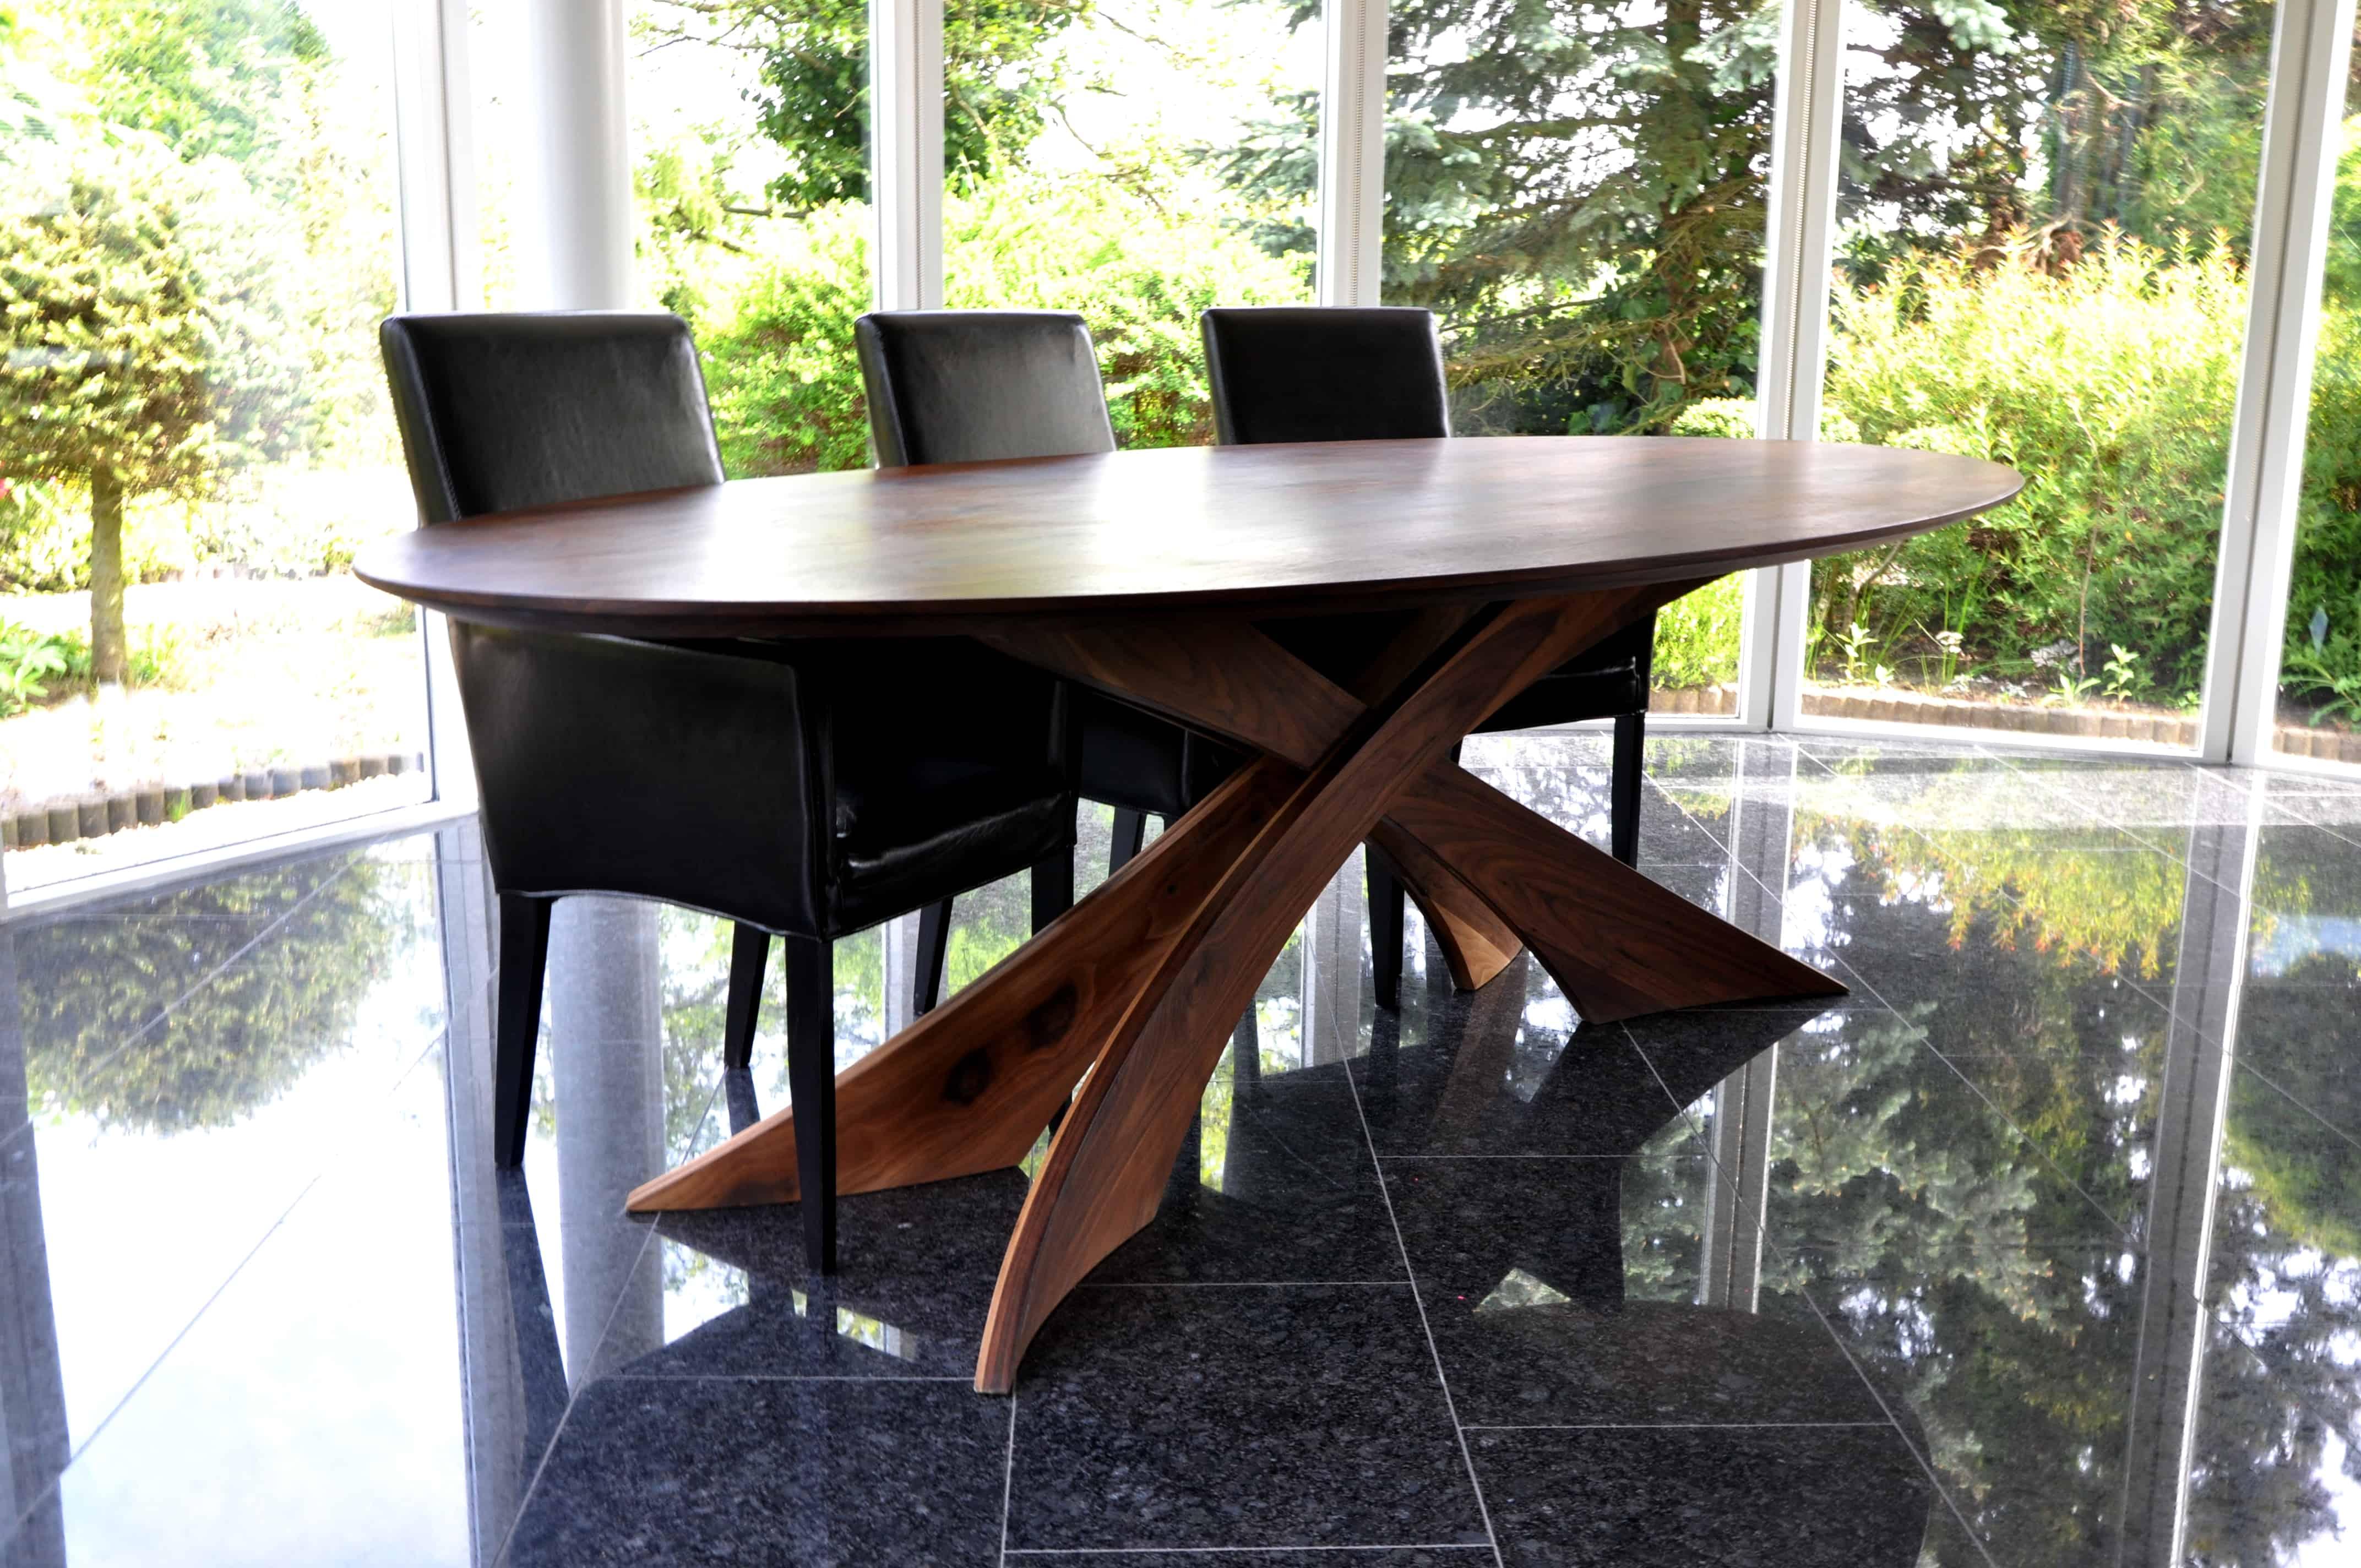 Massief noten houten notenhouten rechte rechthoek eetkamer keuken tafel tafels design